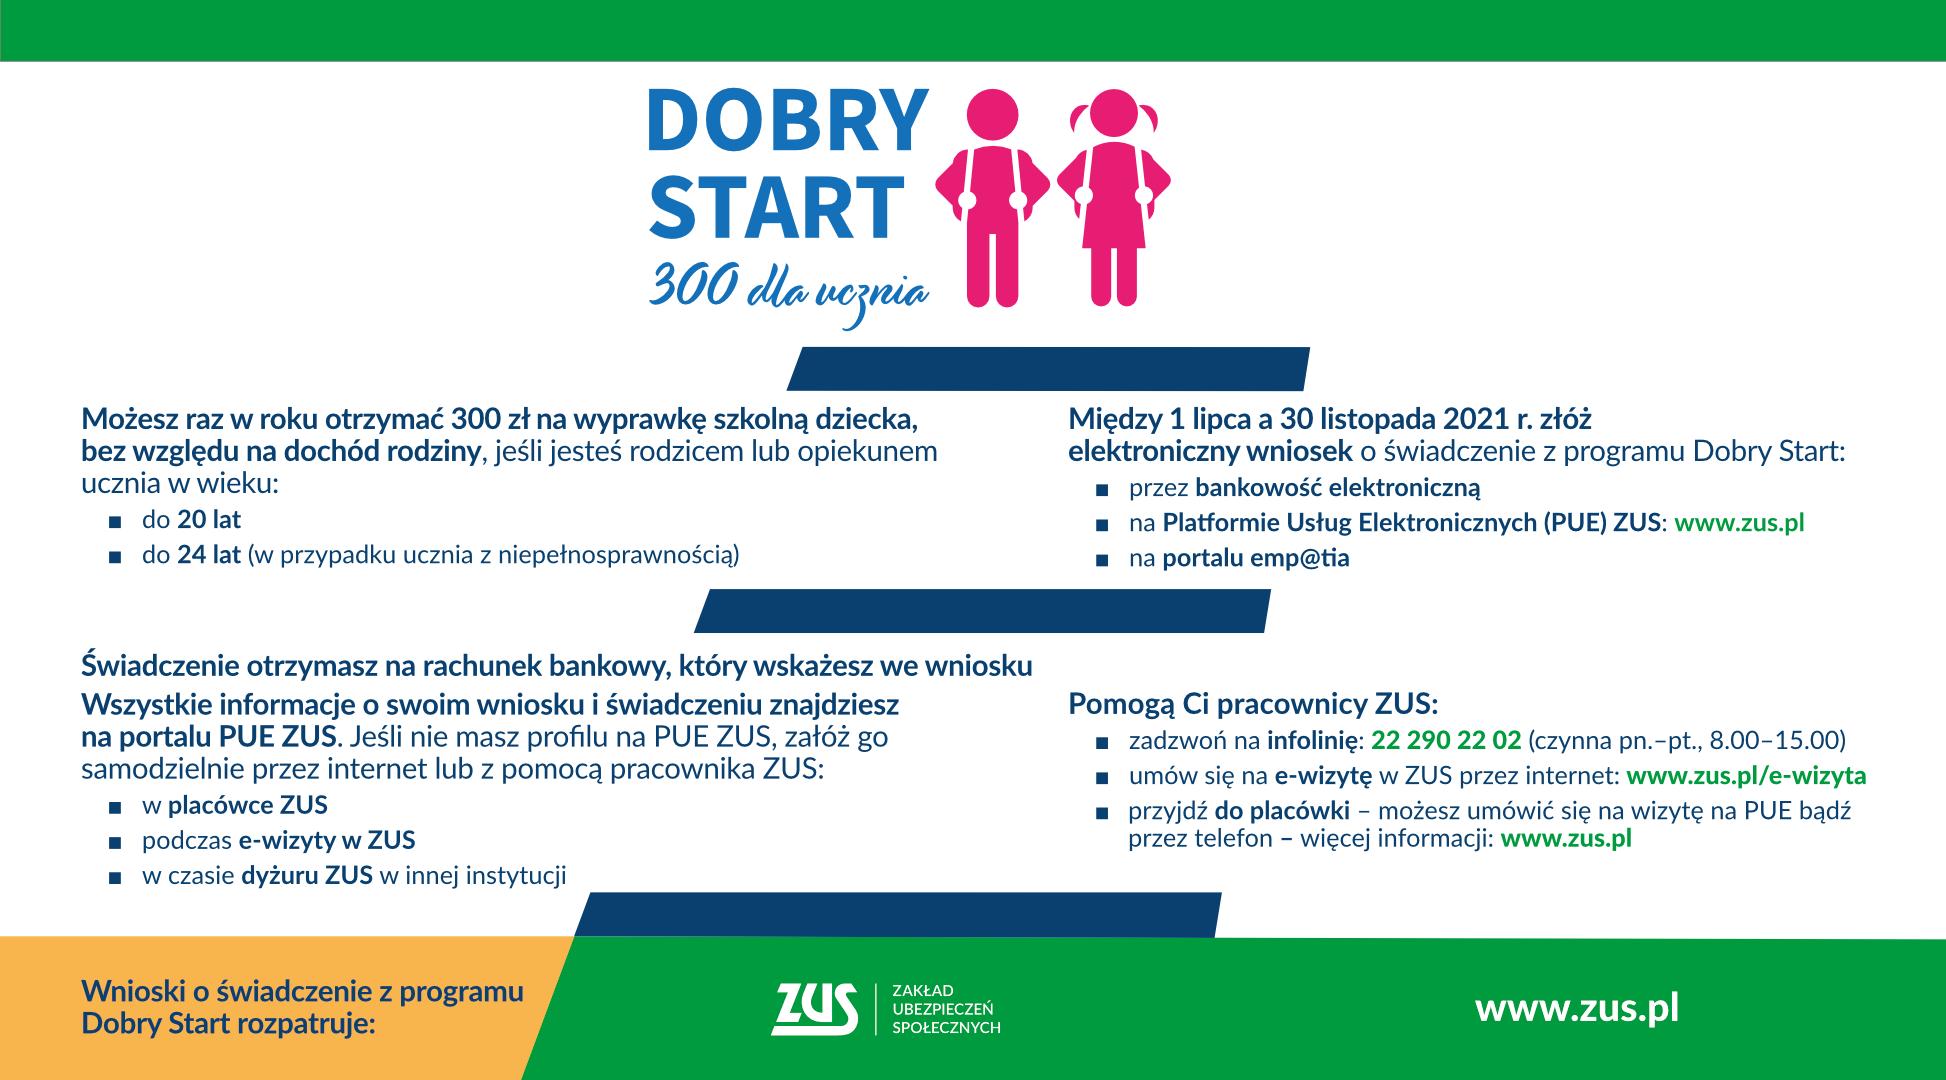 infografika Dobry Start inf. ogólne - poziom